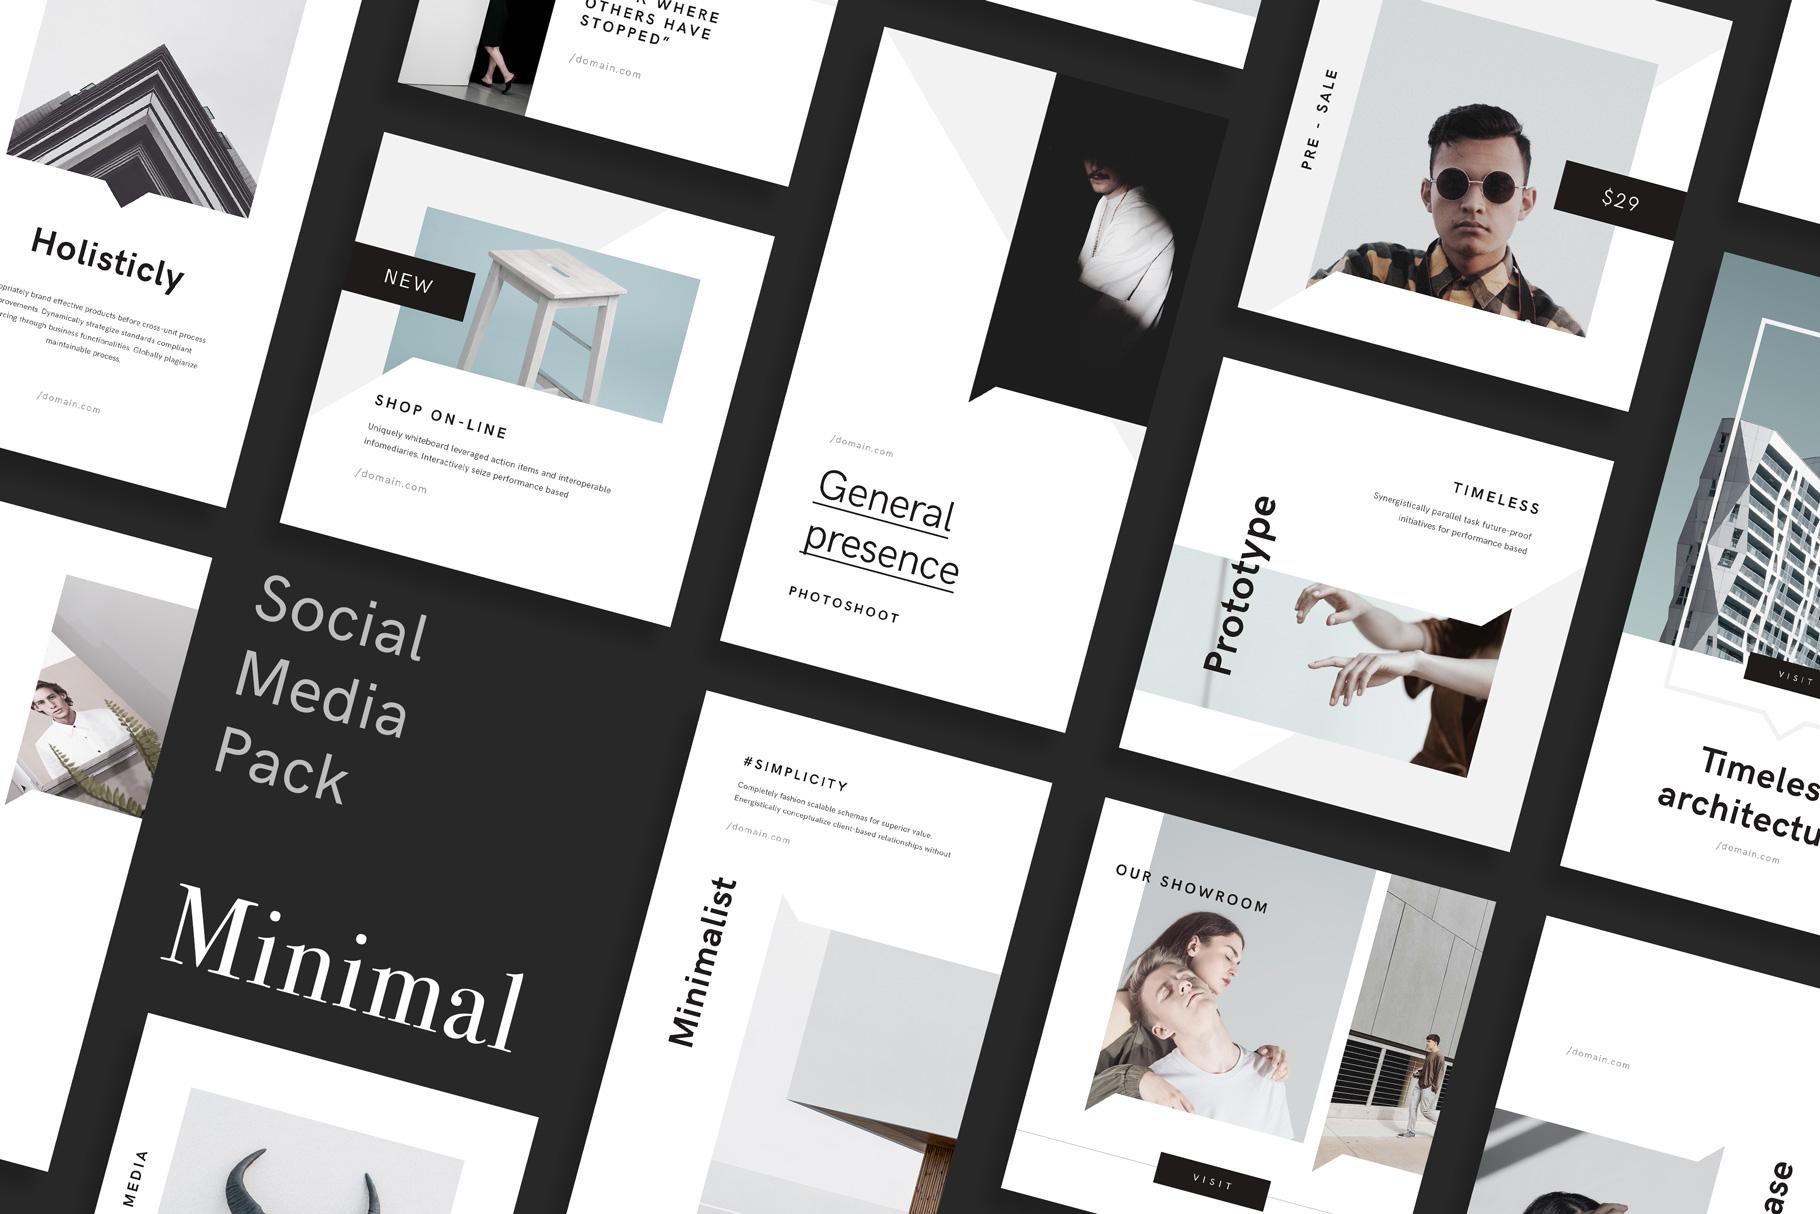 Minimal social media pack by goashape cover